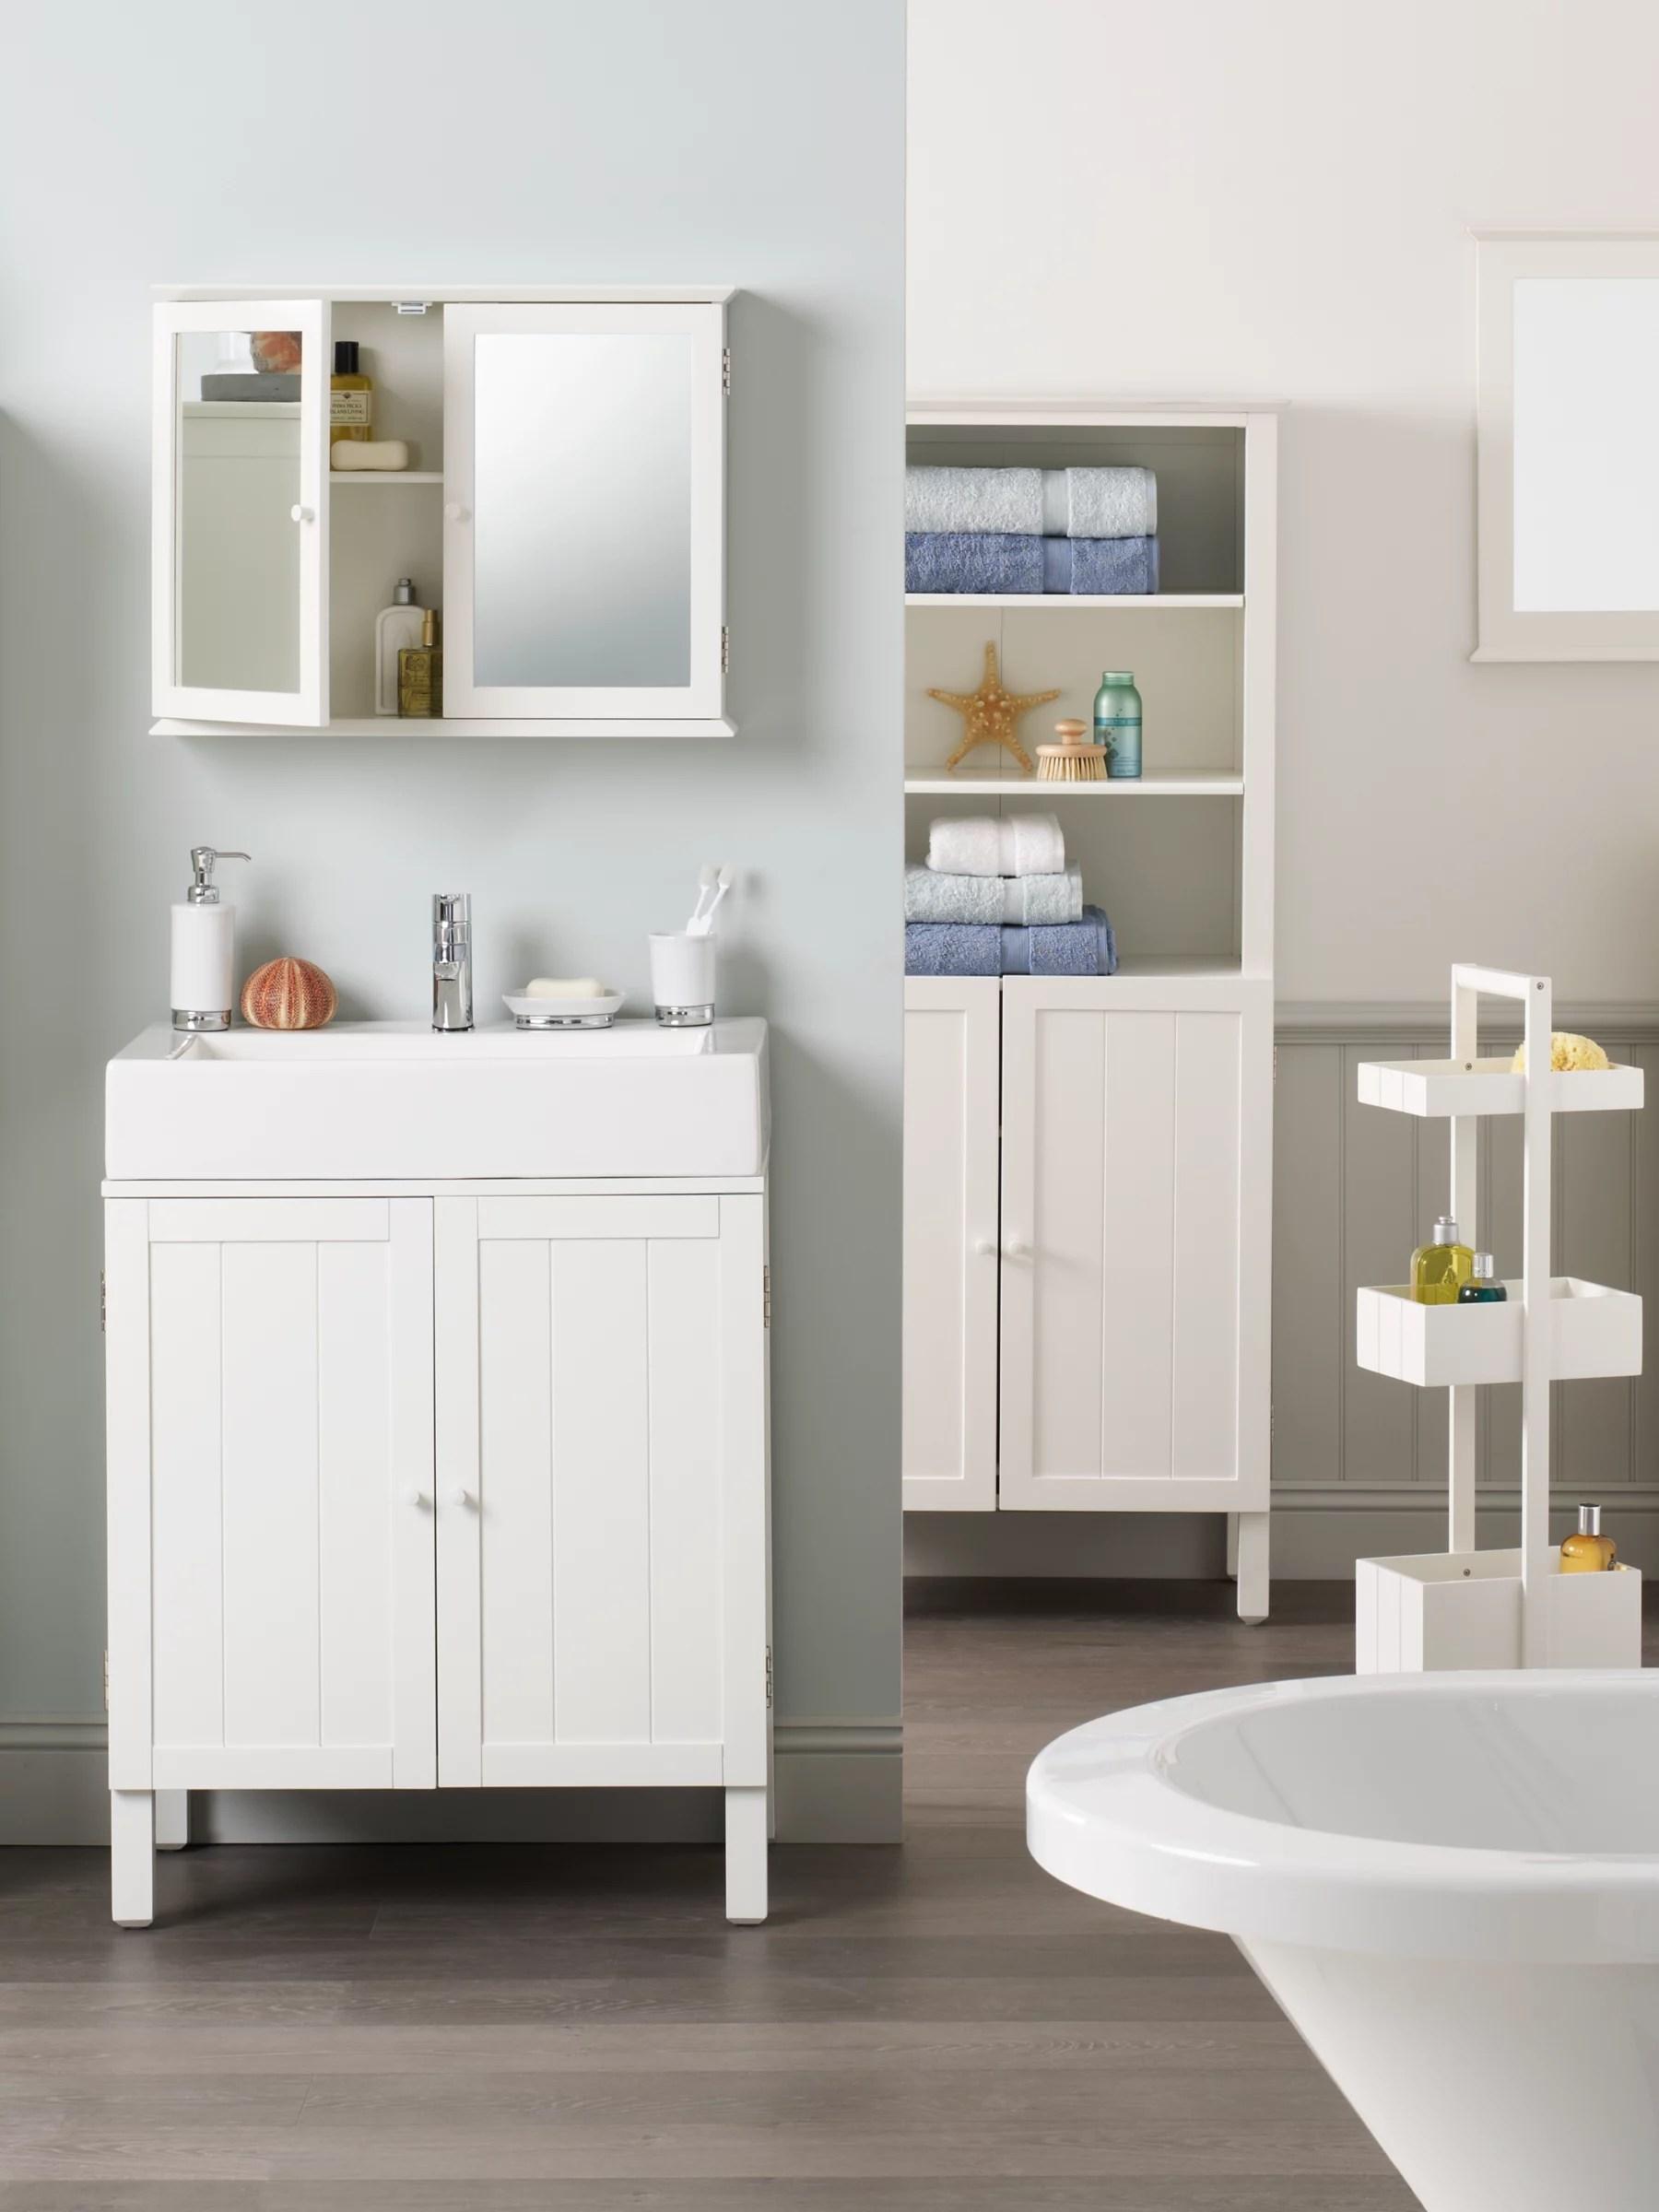 Bathroom Cabinets John Lewis st ives bathroom furniture